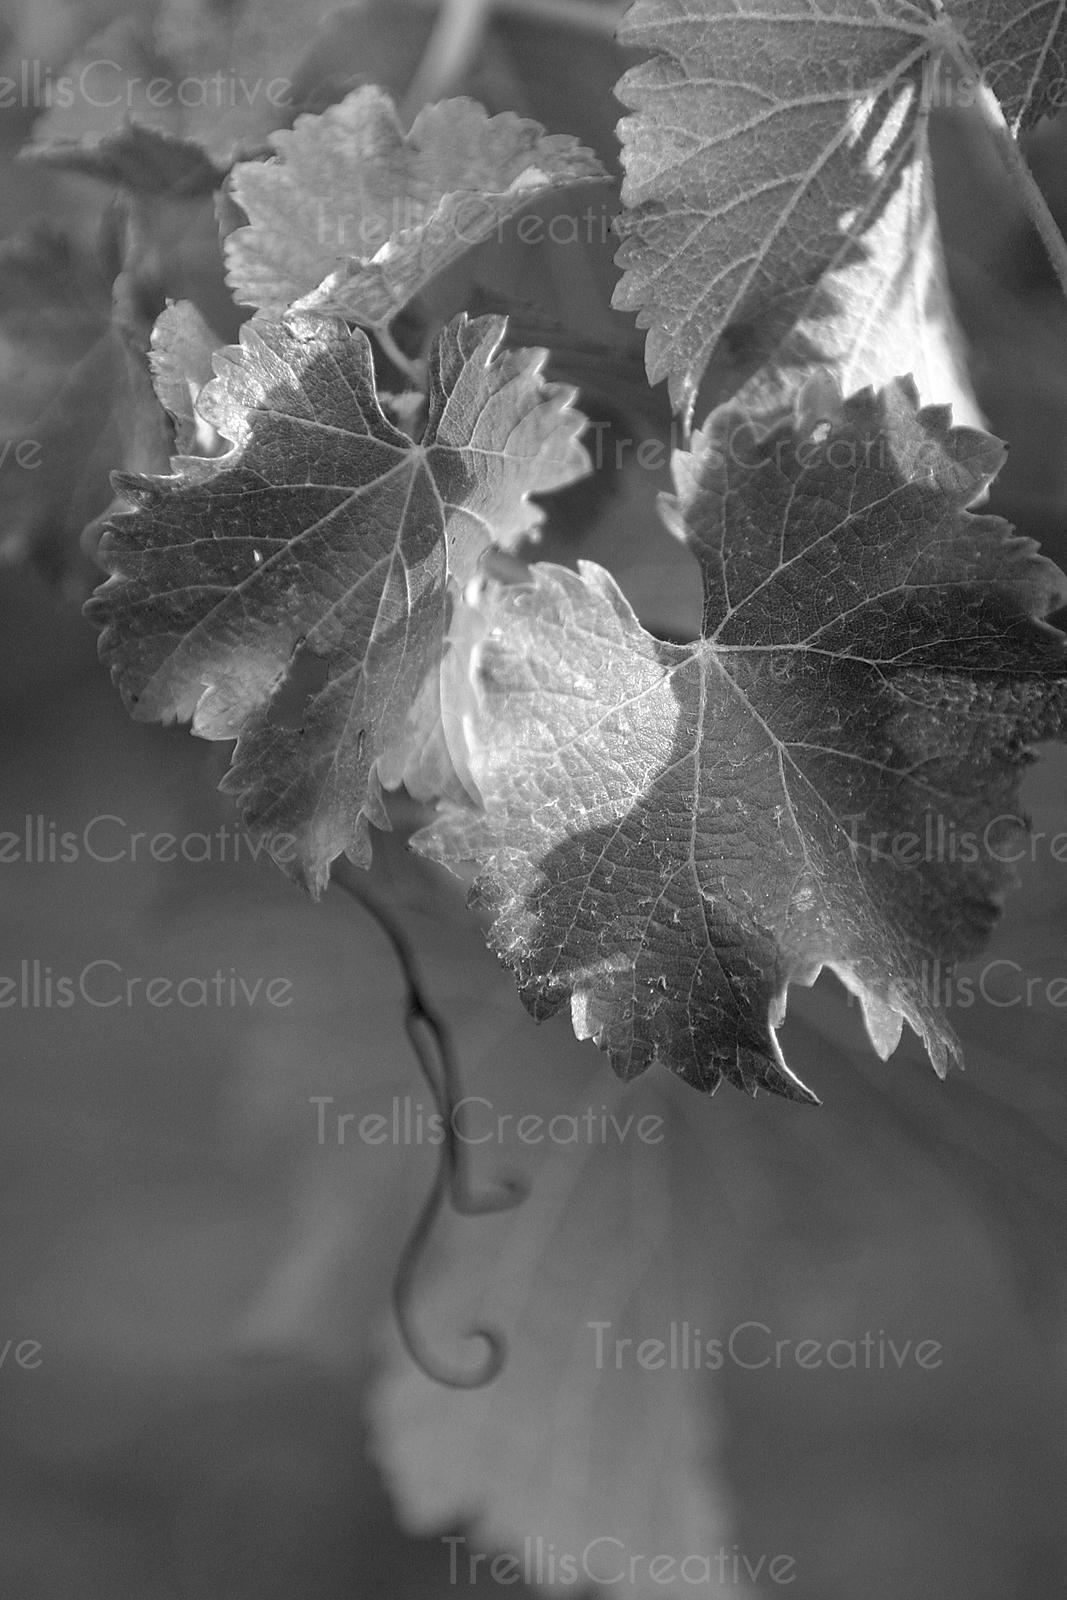 Trellis Creative | Grape Vine